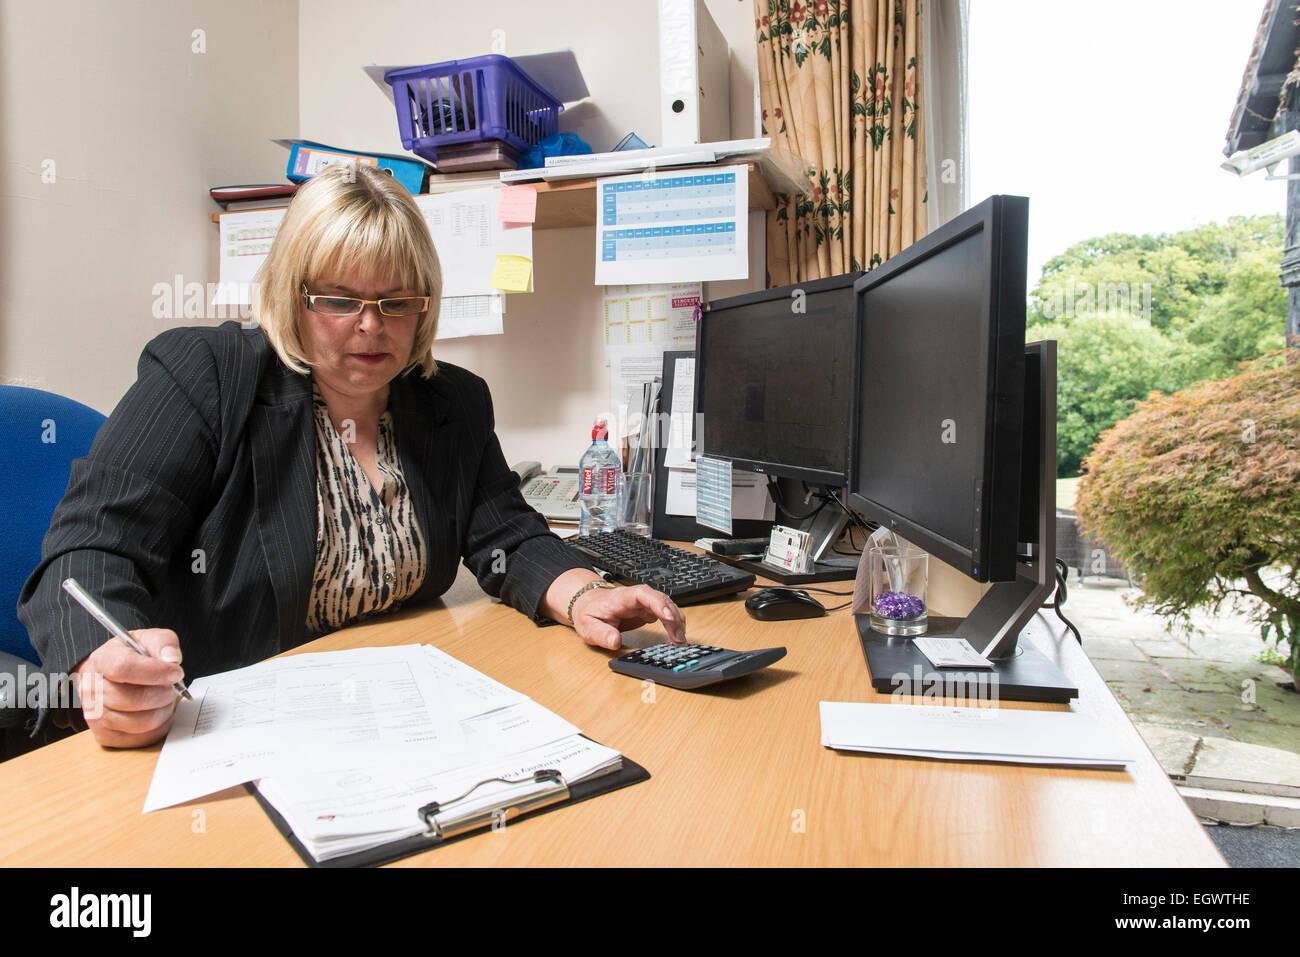 Office Management - duties, expenses